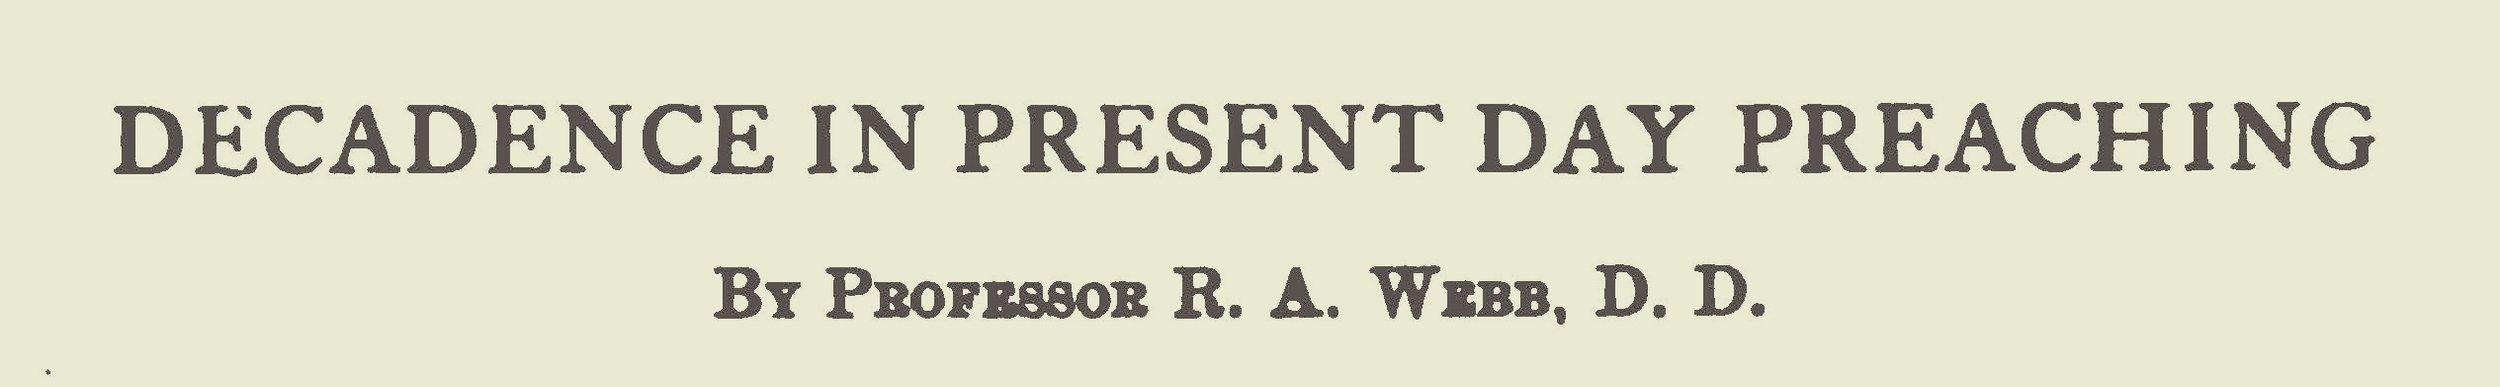 Webb, Robert Alexander, Decadence in Present Day Preaching Title Page.jpg